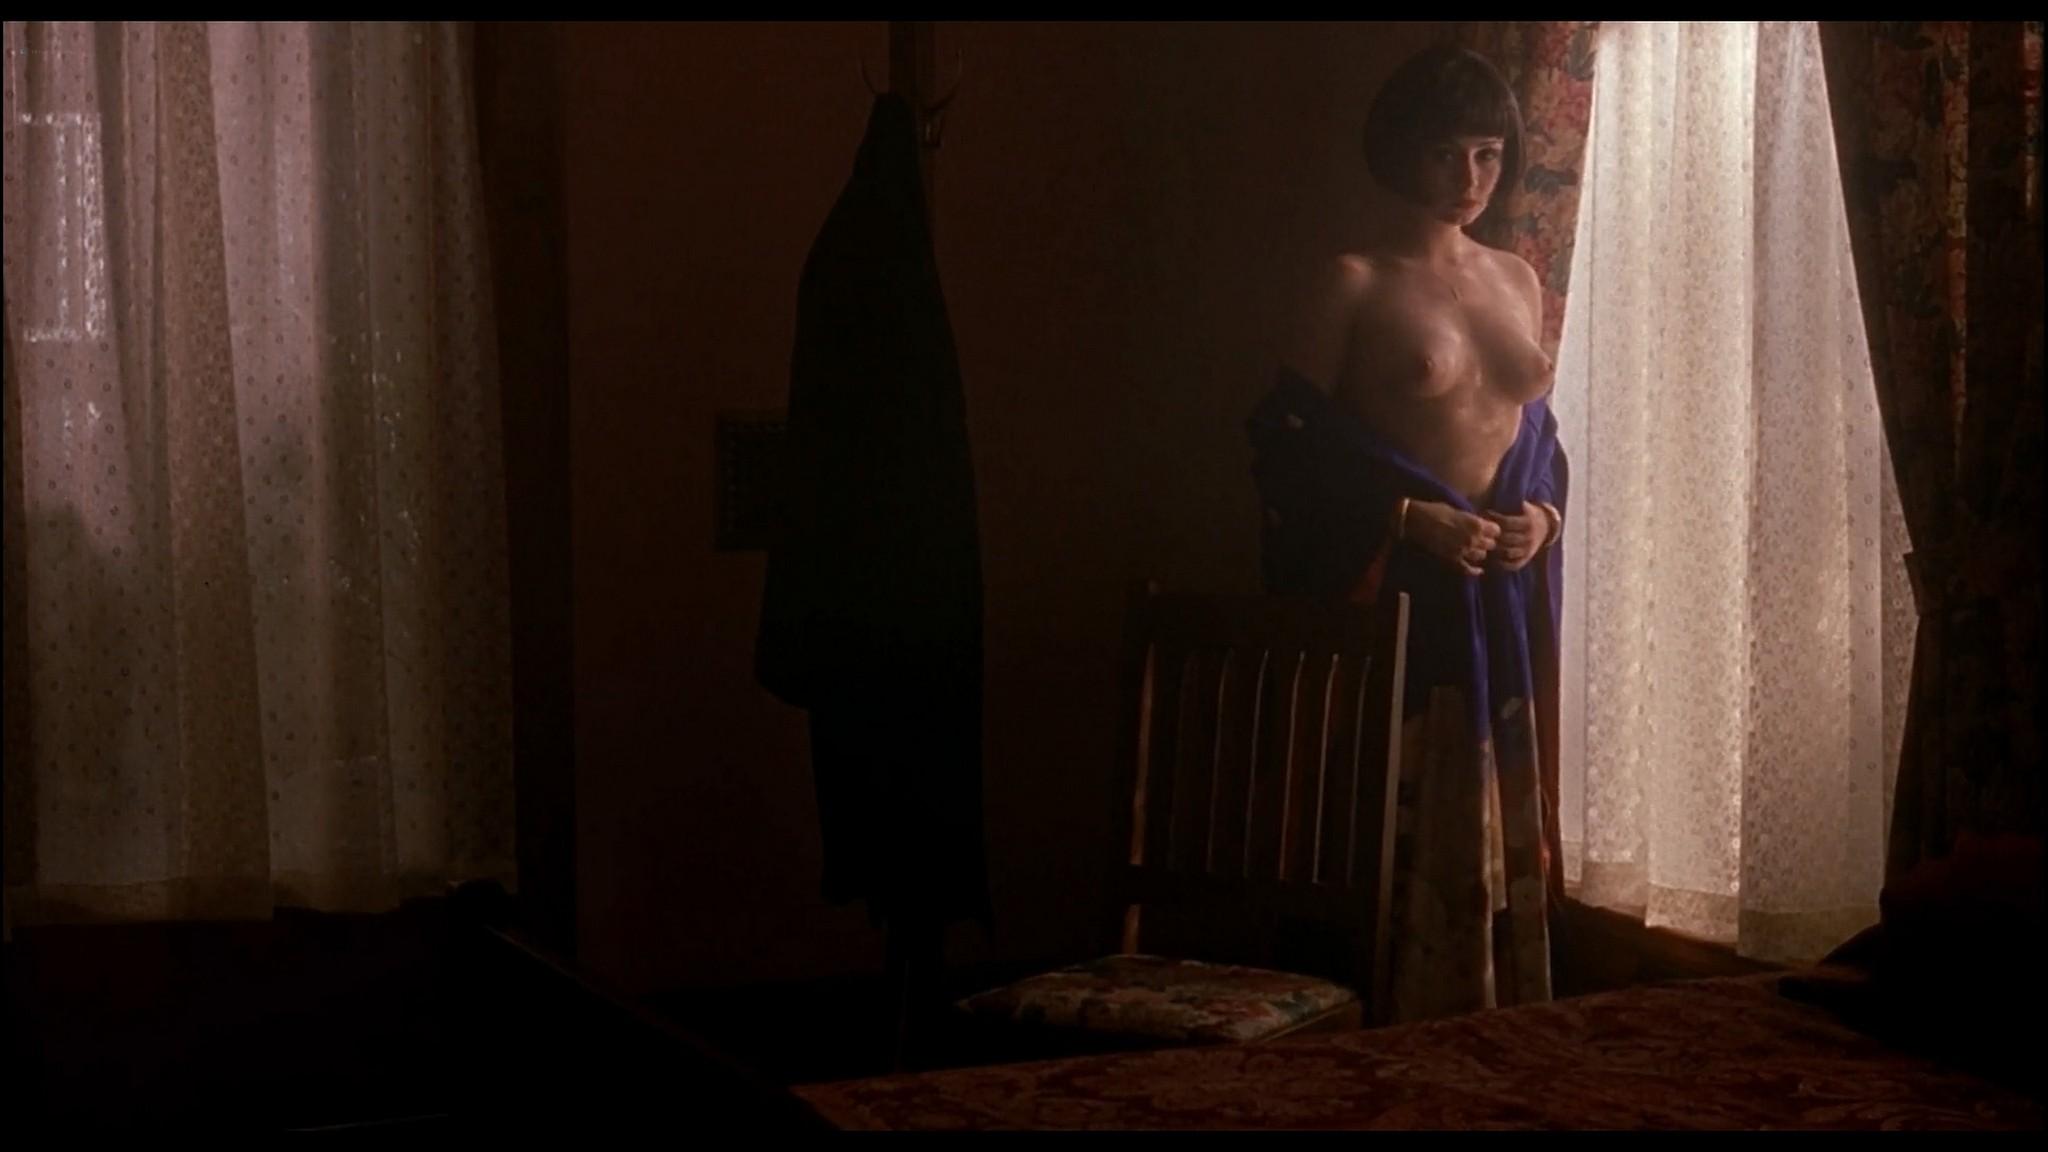 Nina Siemaszko nude sex Lydie Denier Gloria Reuben and others nude sex Wild Orchid 2 1992 1080p BluRay 13